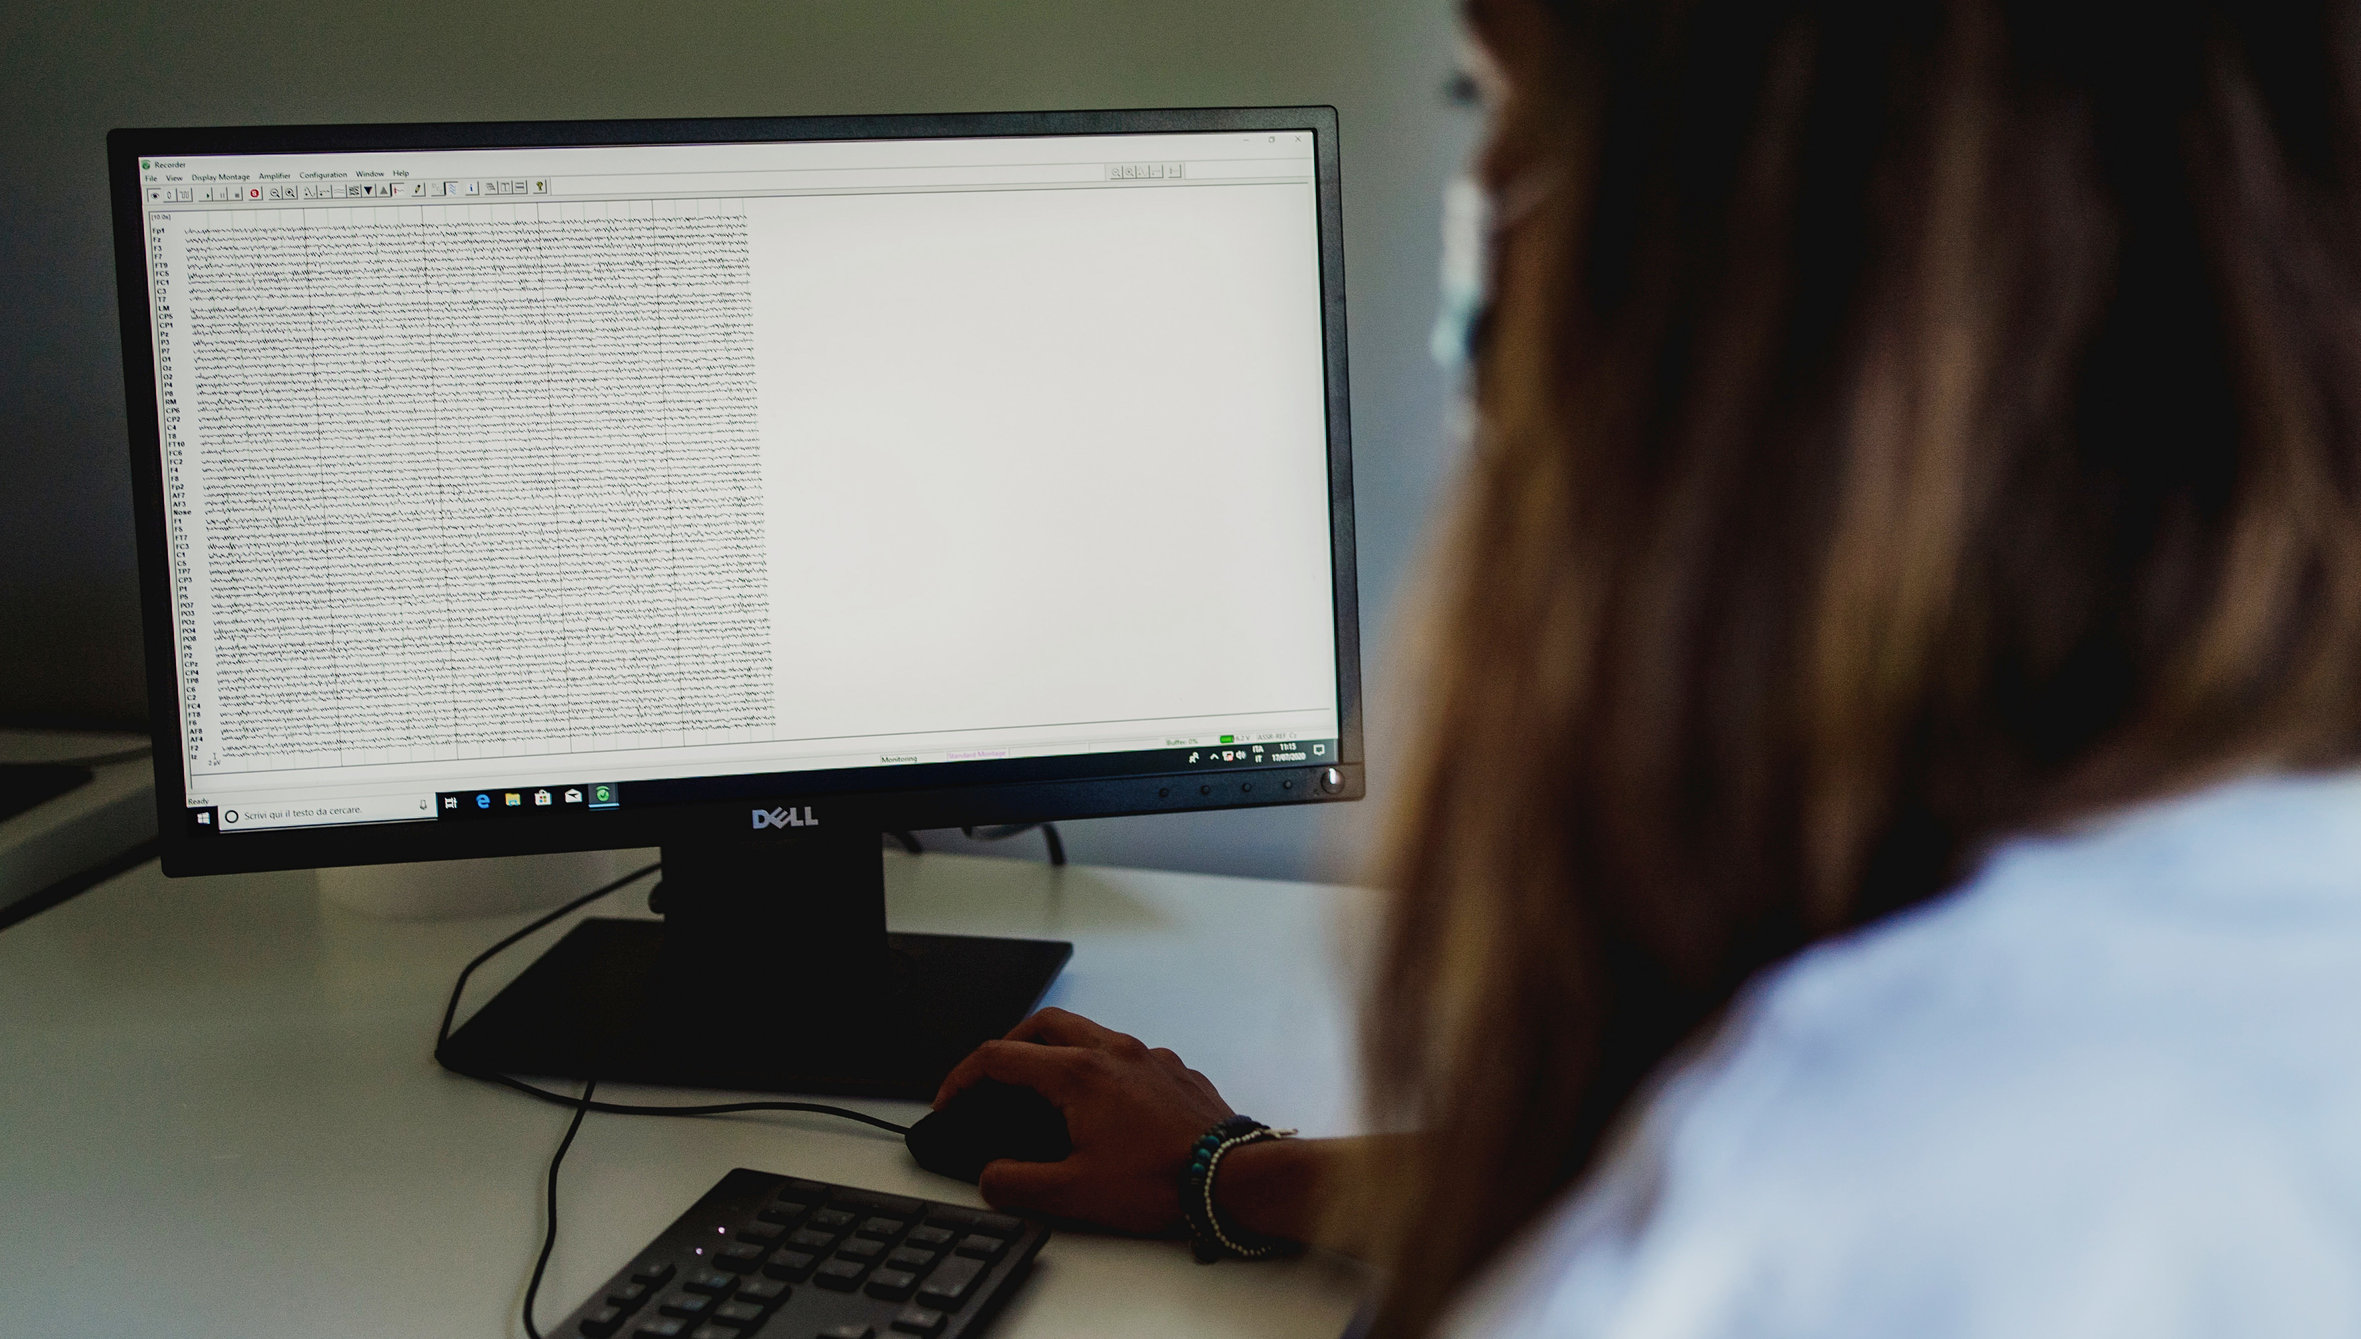 neurofisiologia clinica ricercatore ricercatrice computer dati screen